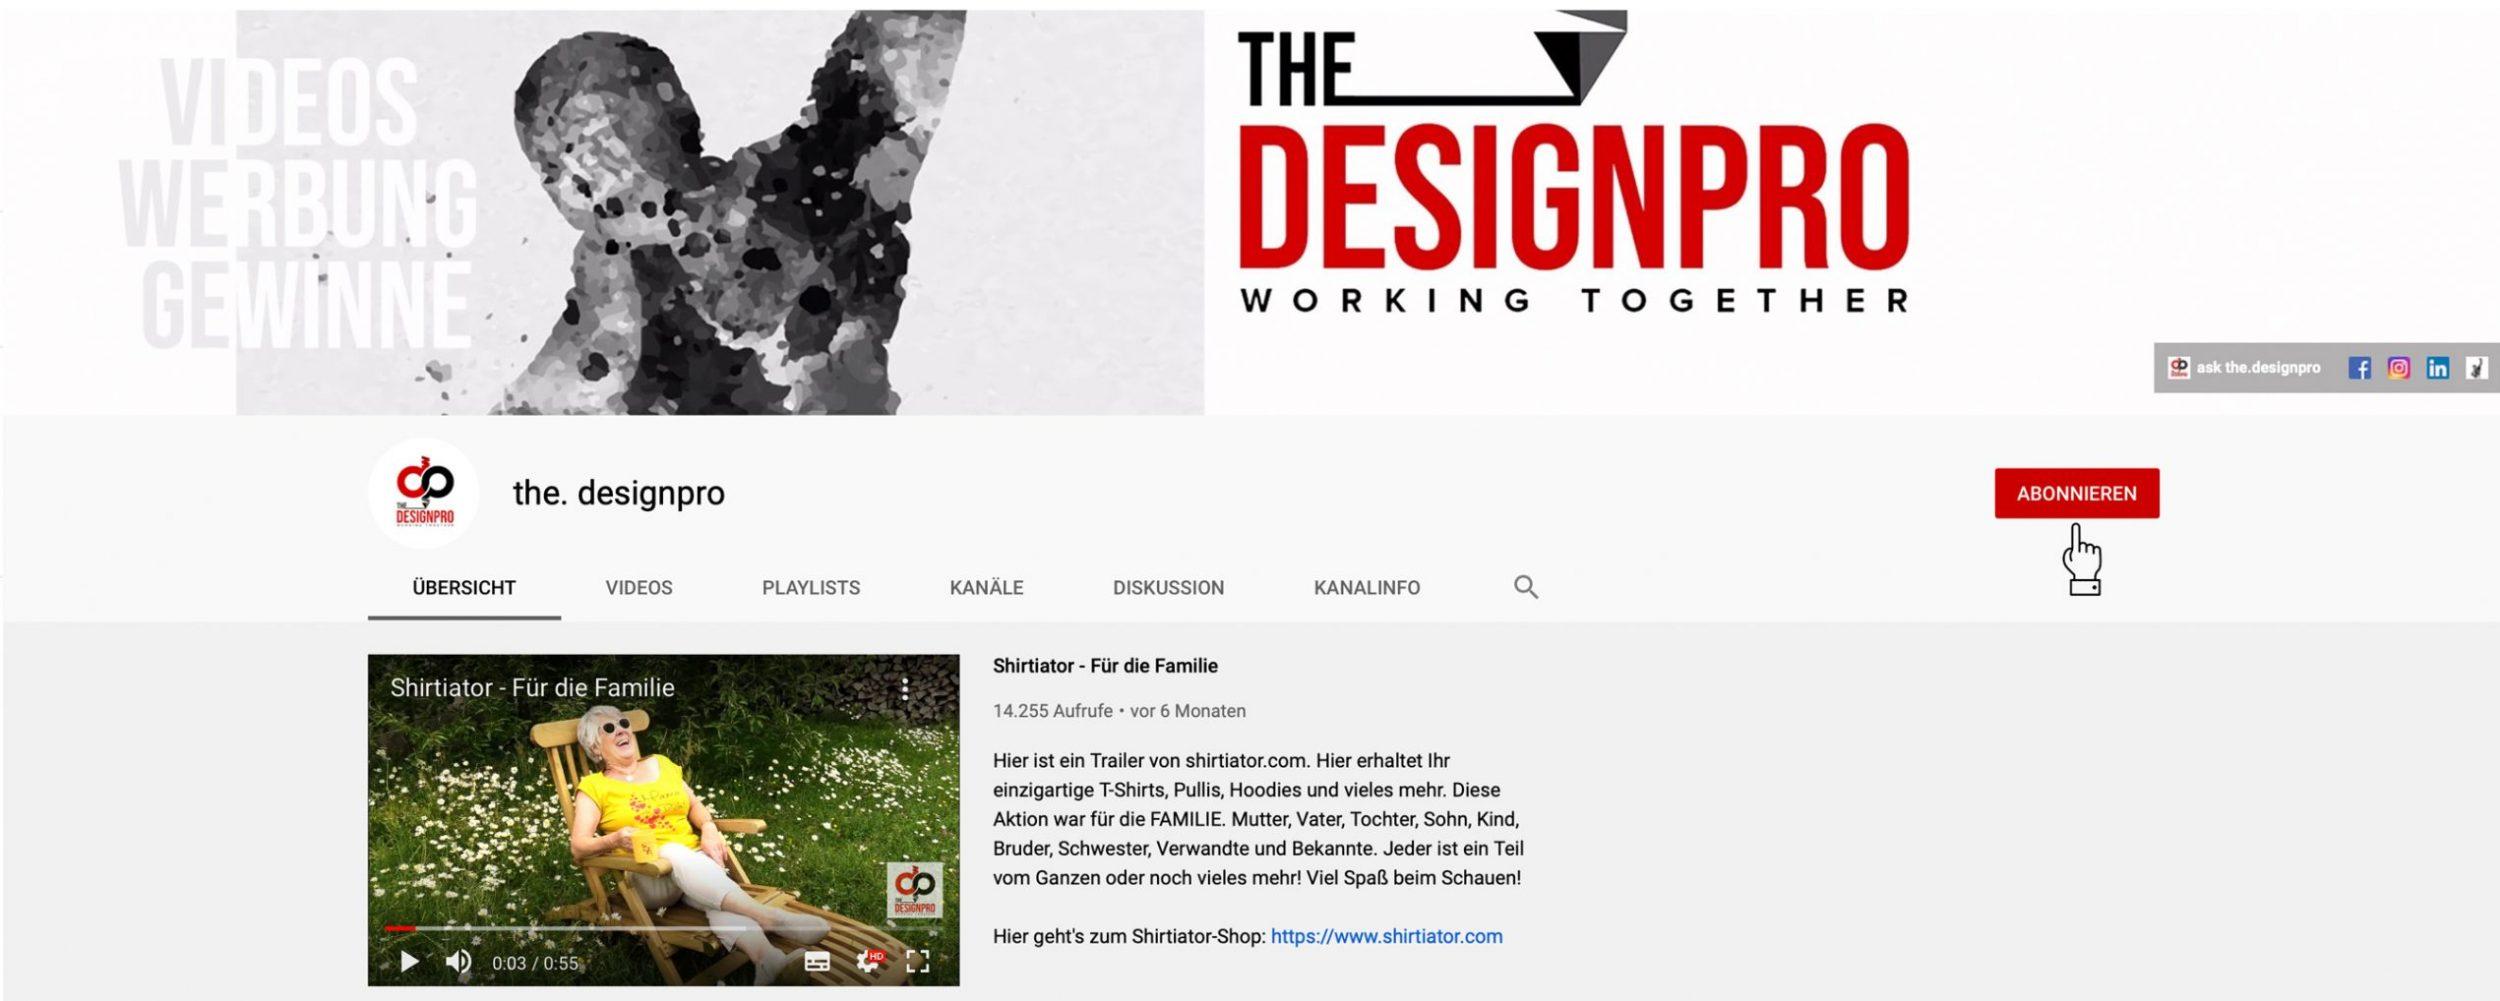 the.designpro